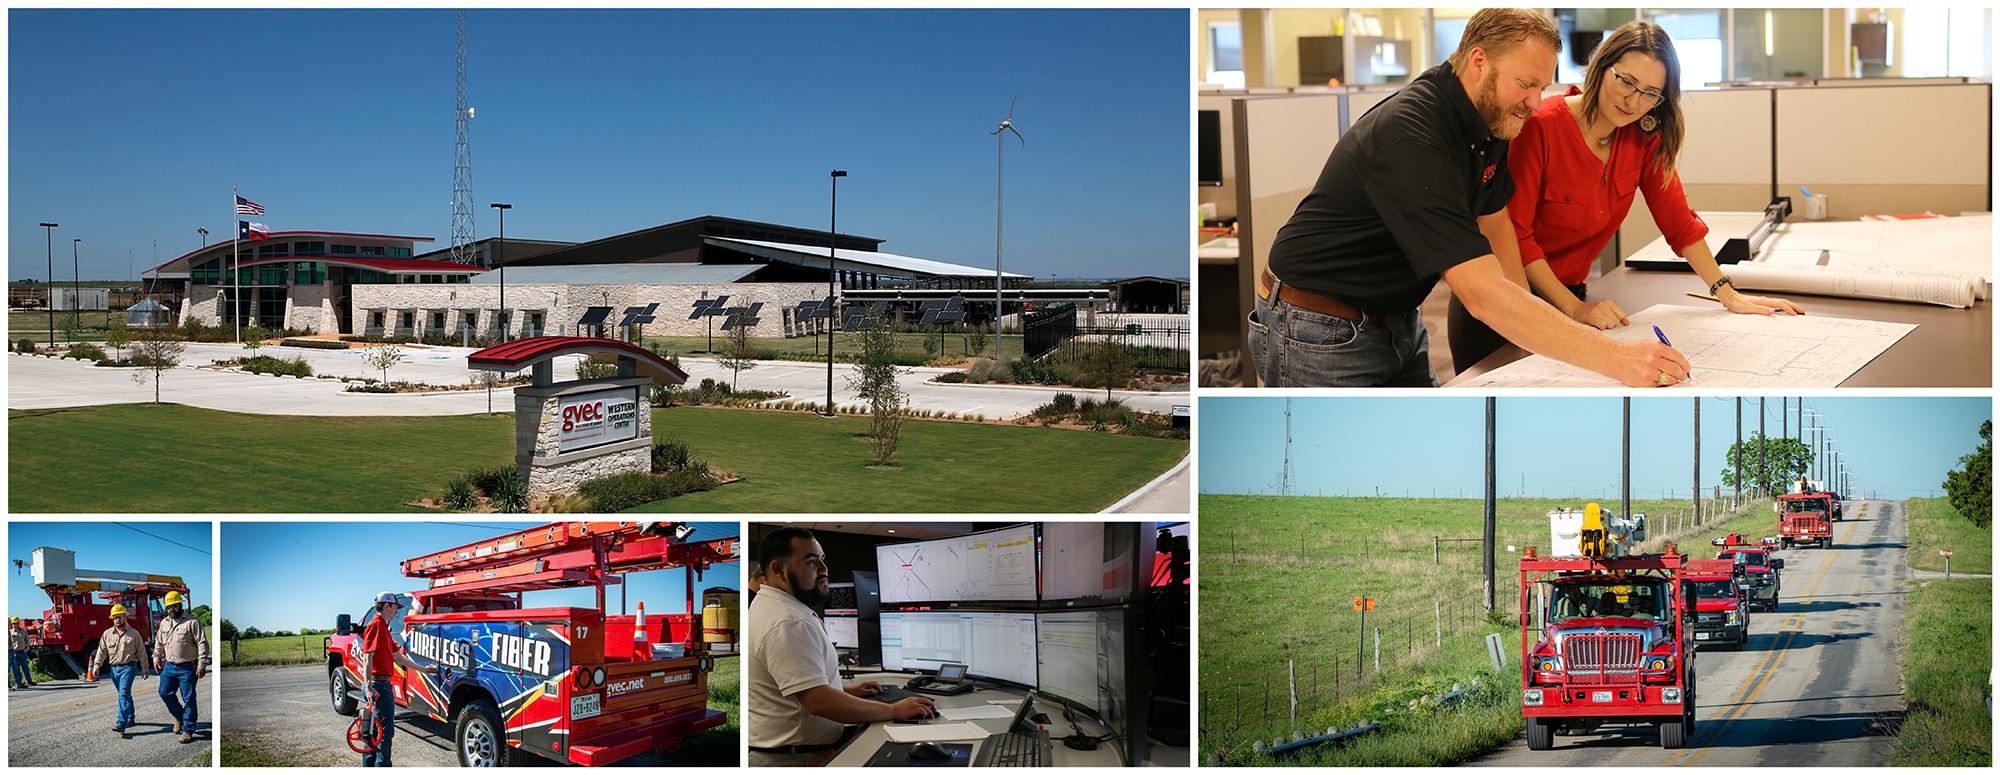 photos of gvec locations